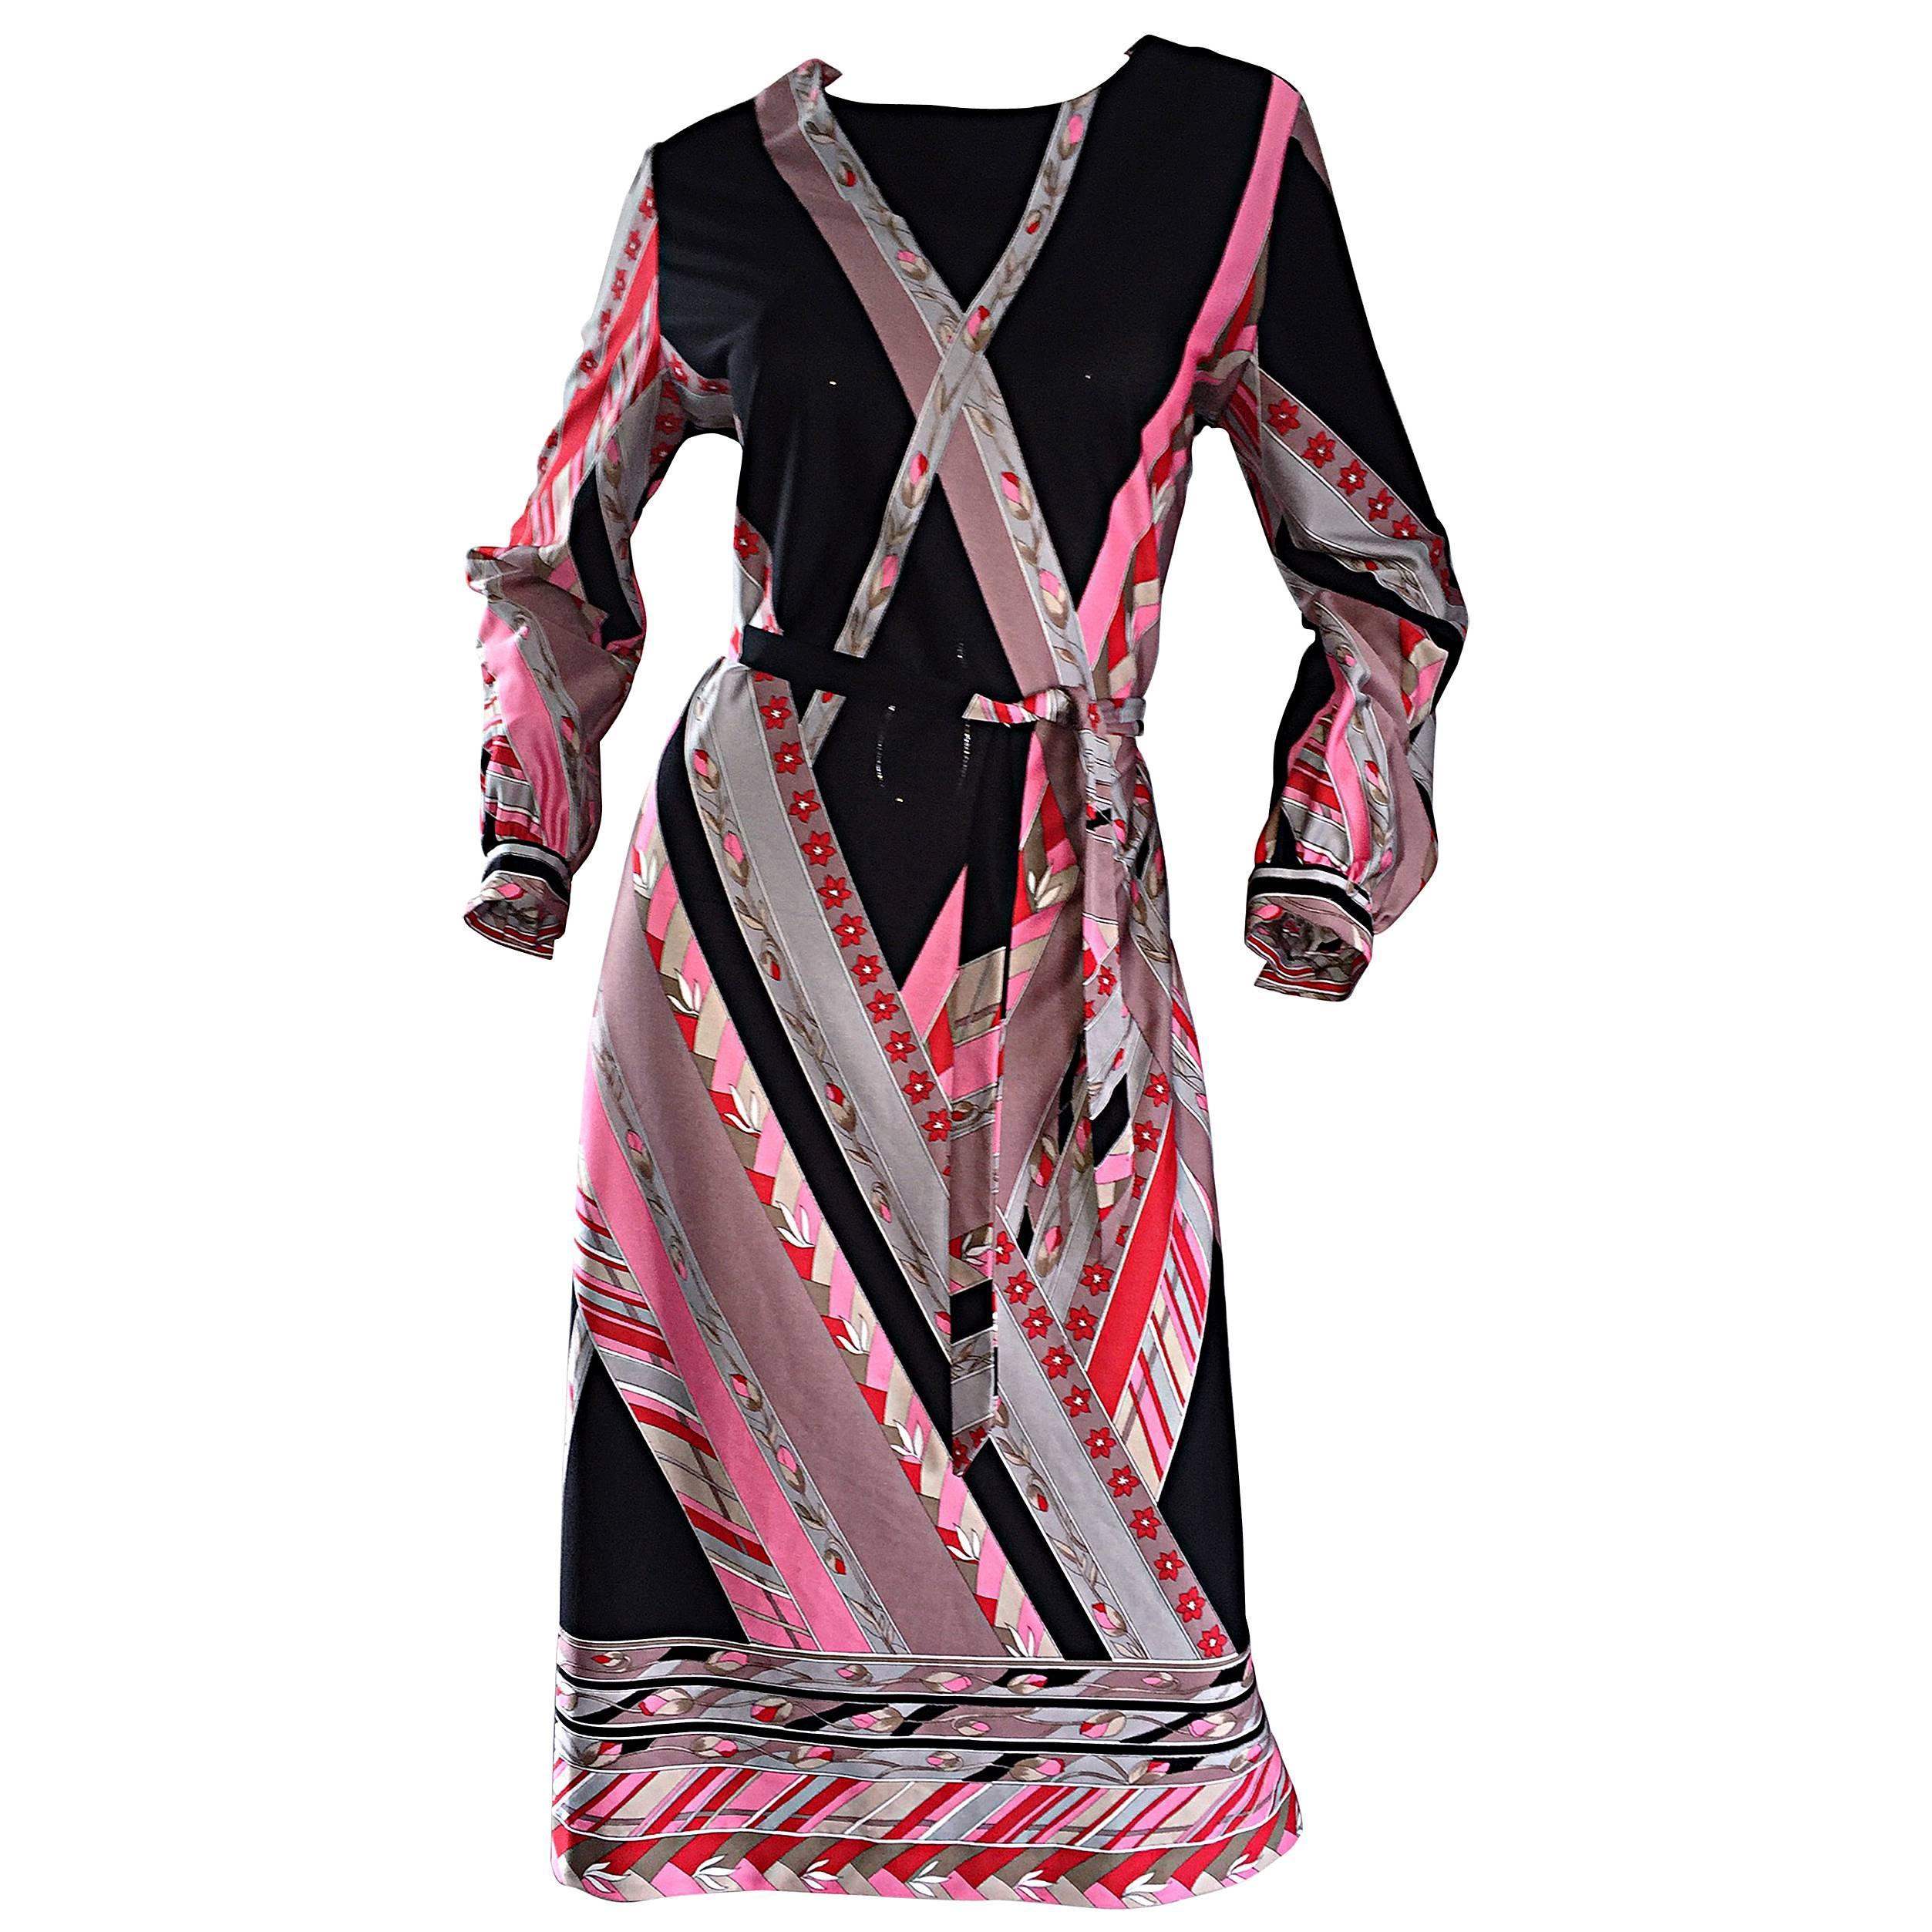 Vintage Lanvin 1970s 70s Large Pink + Red + Gray Belted Geometric Flower Dress